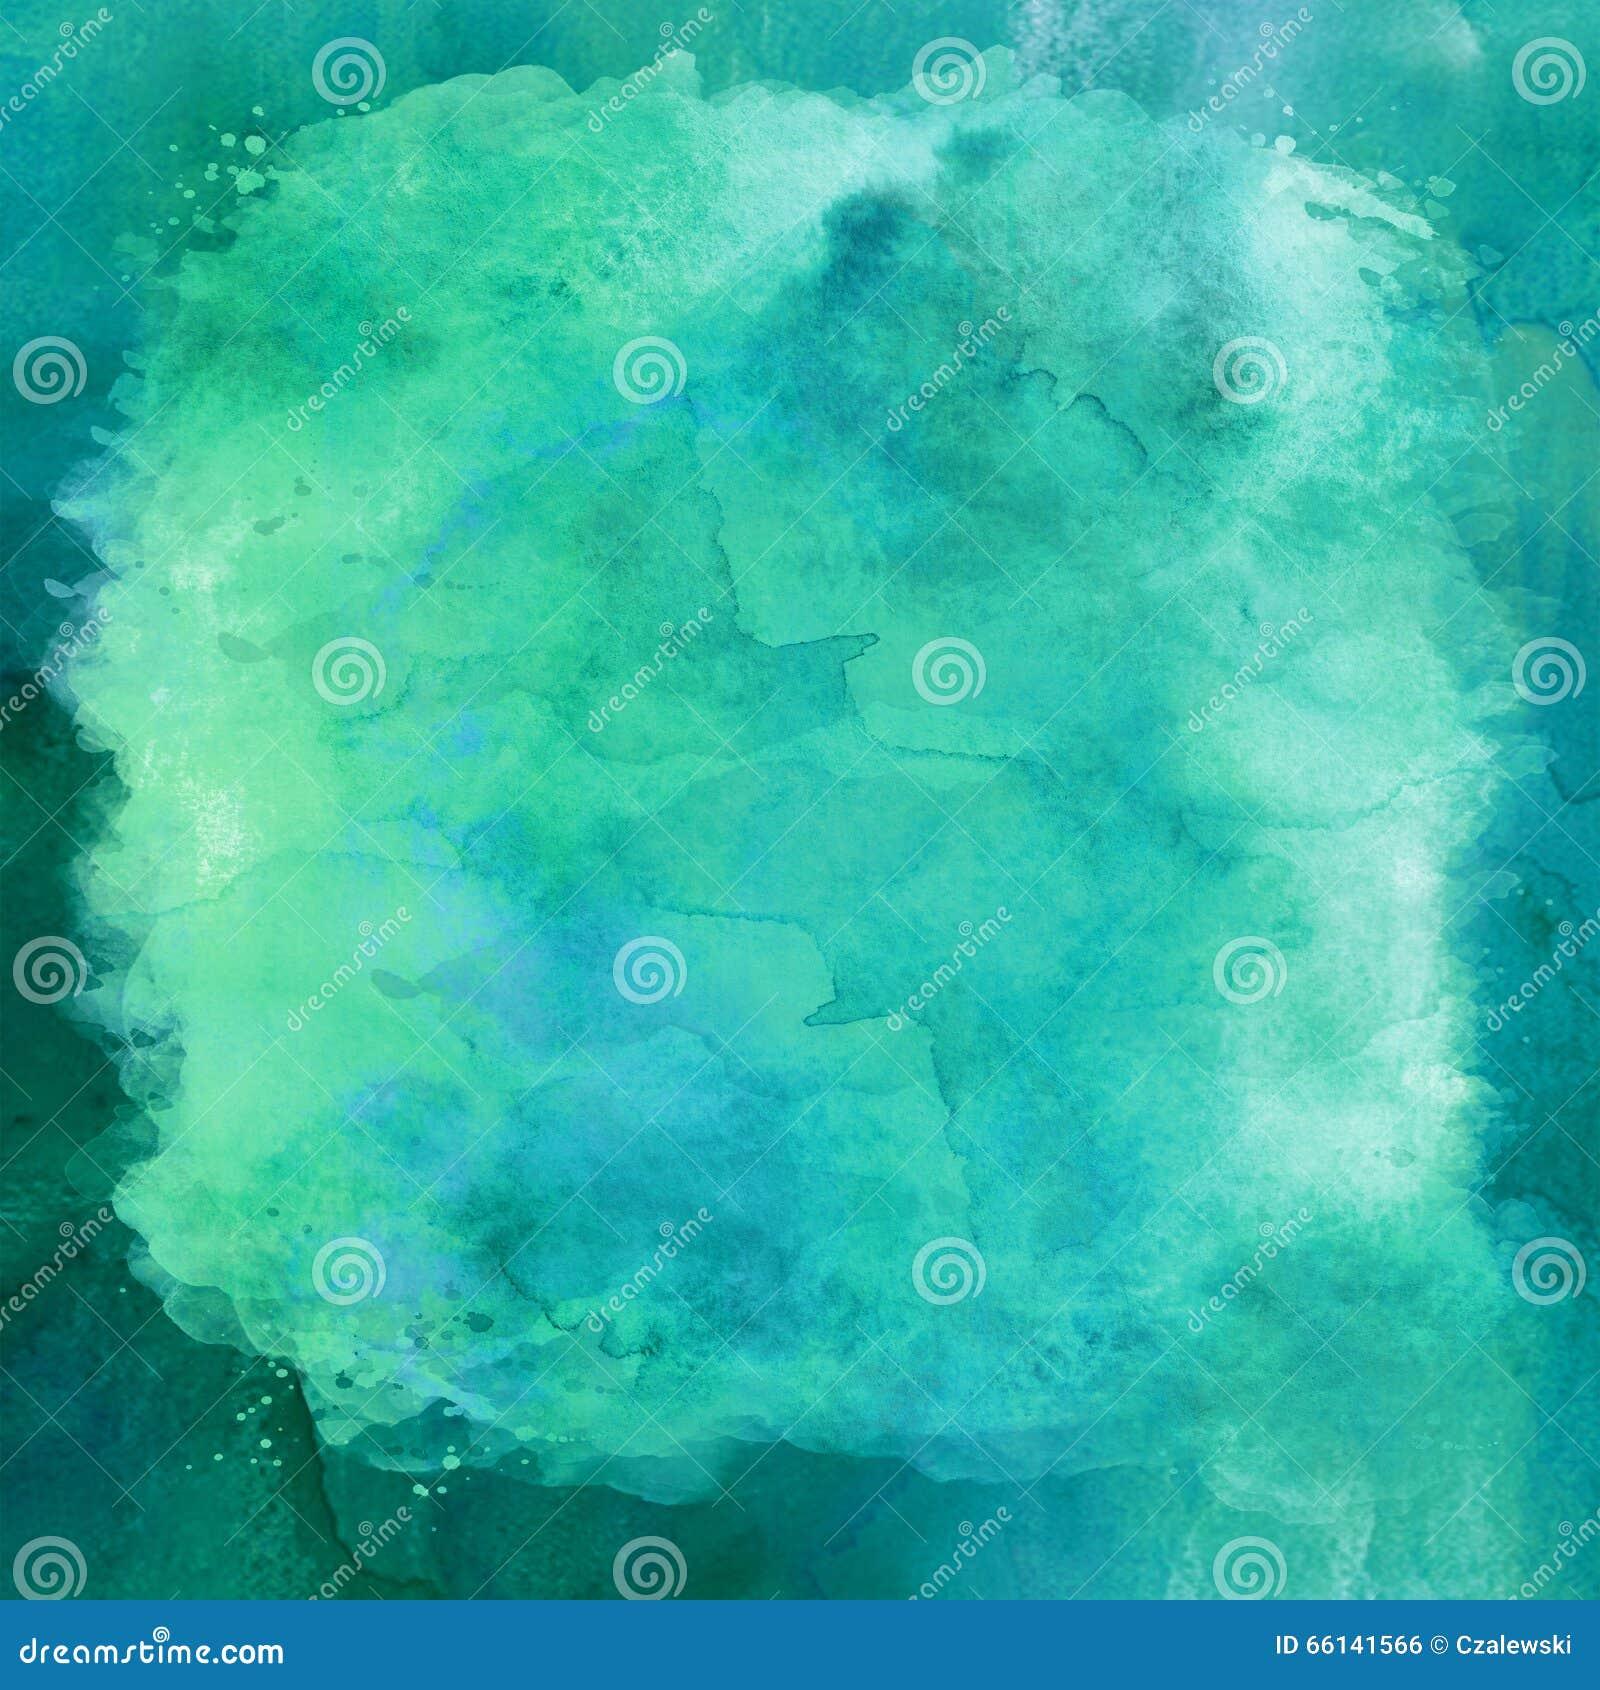 Verde blu Aqua Teal Turquoise Watercolor Paper Background